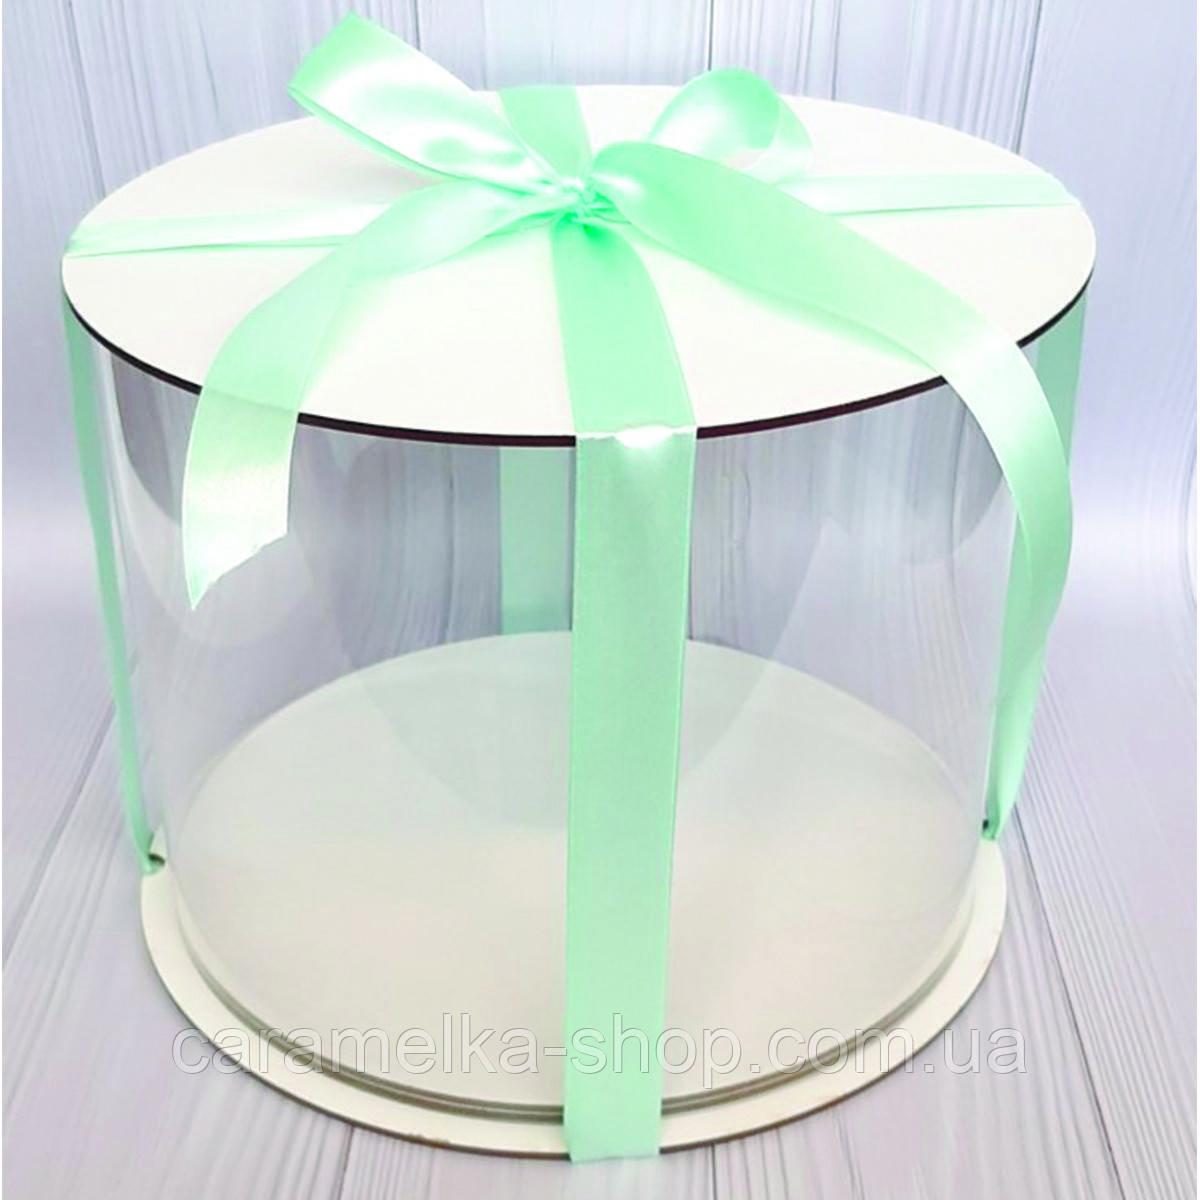 Коробка для торта Тубус прозрачный 25*20см